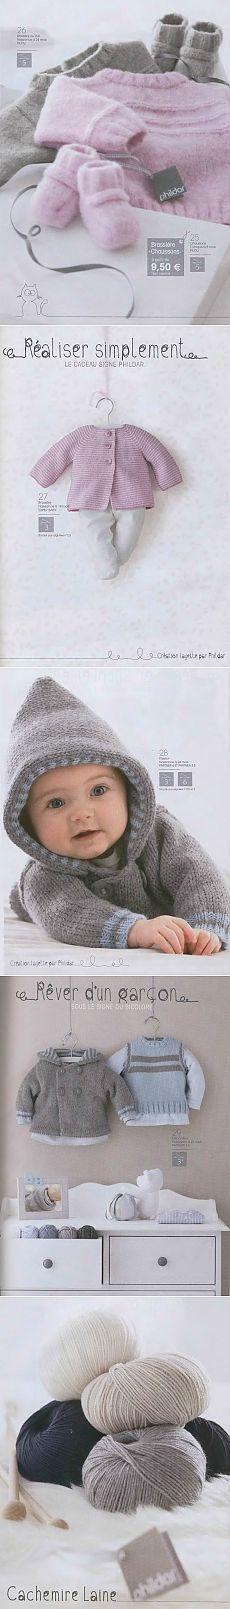 Вязание спицами для младенцев